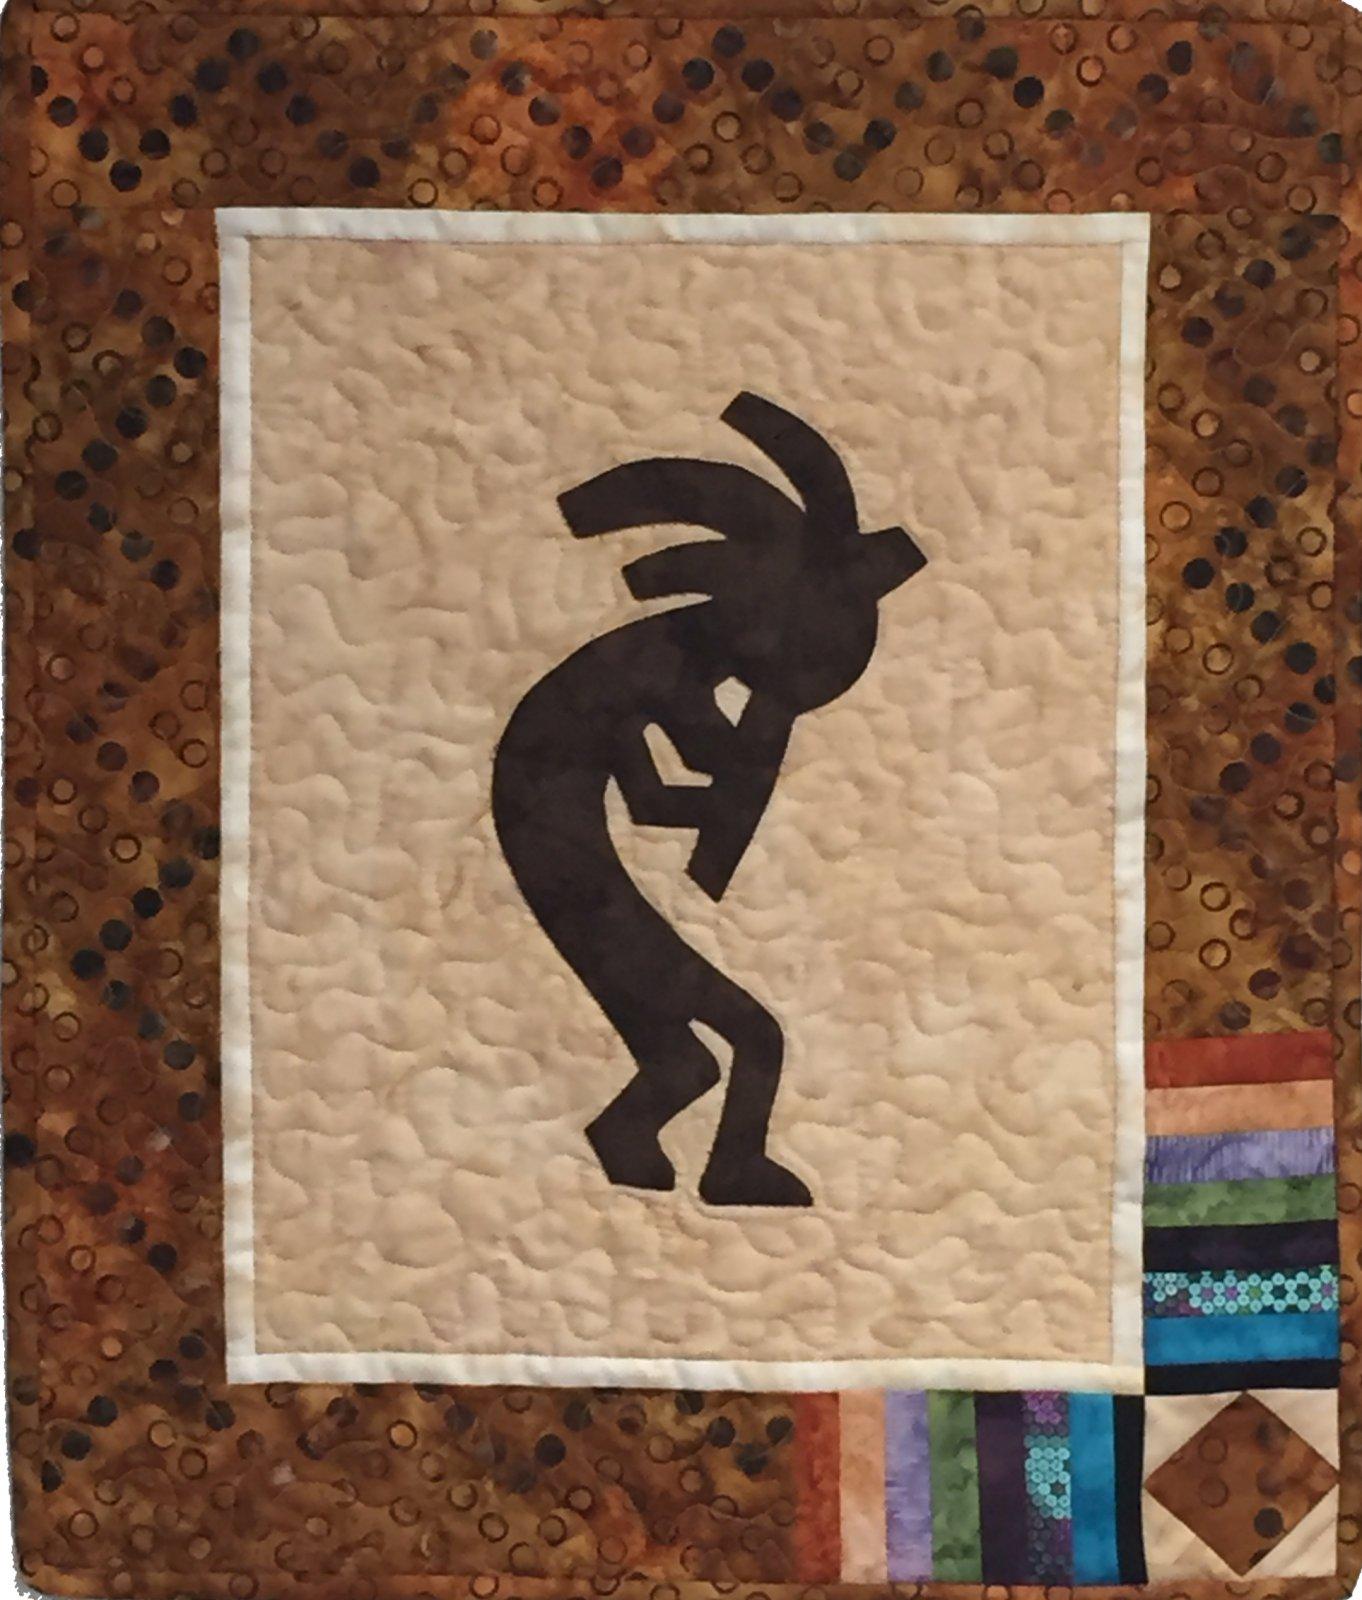 Kokopelli Quilt Kit : kokopelli quilt pattern - Adamdwight.com